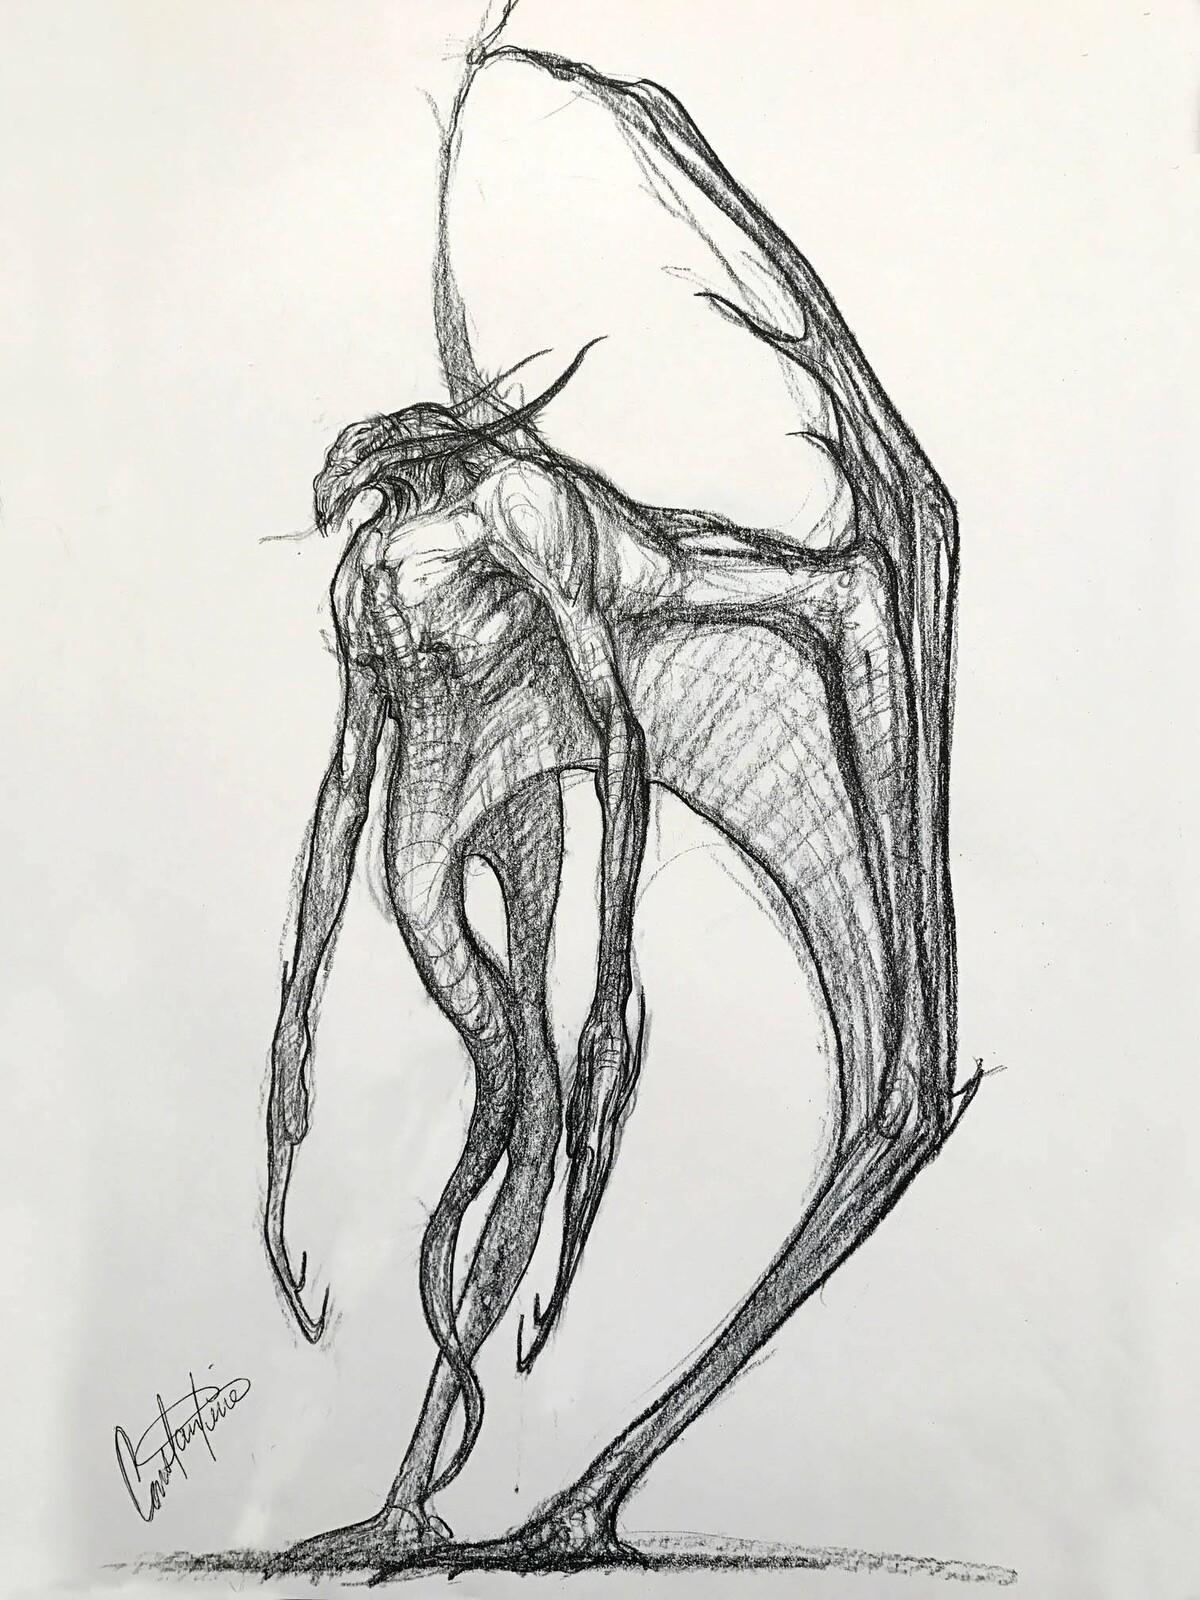 Old demon/bat creature design (cancelled project) 2002